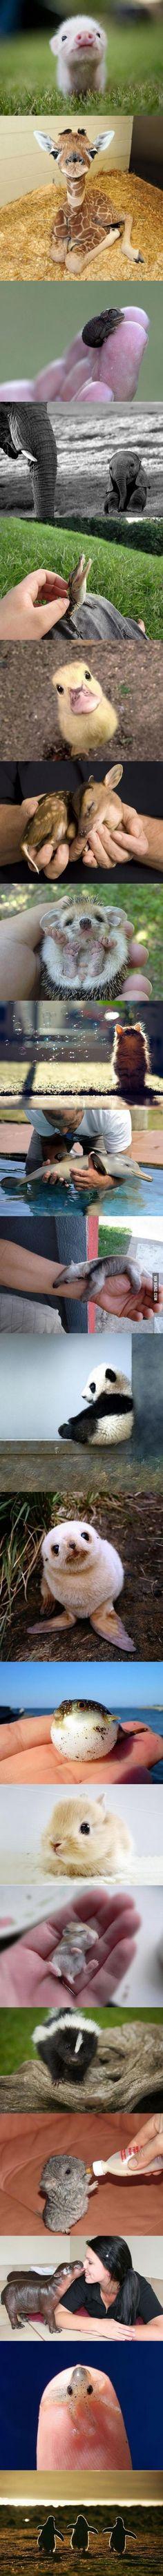 Is it sad I find baby animals cuter than human babies....?